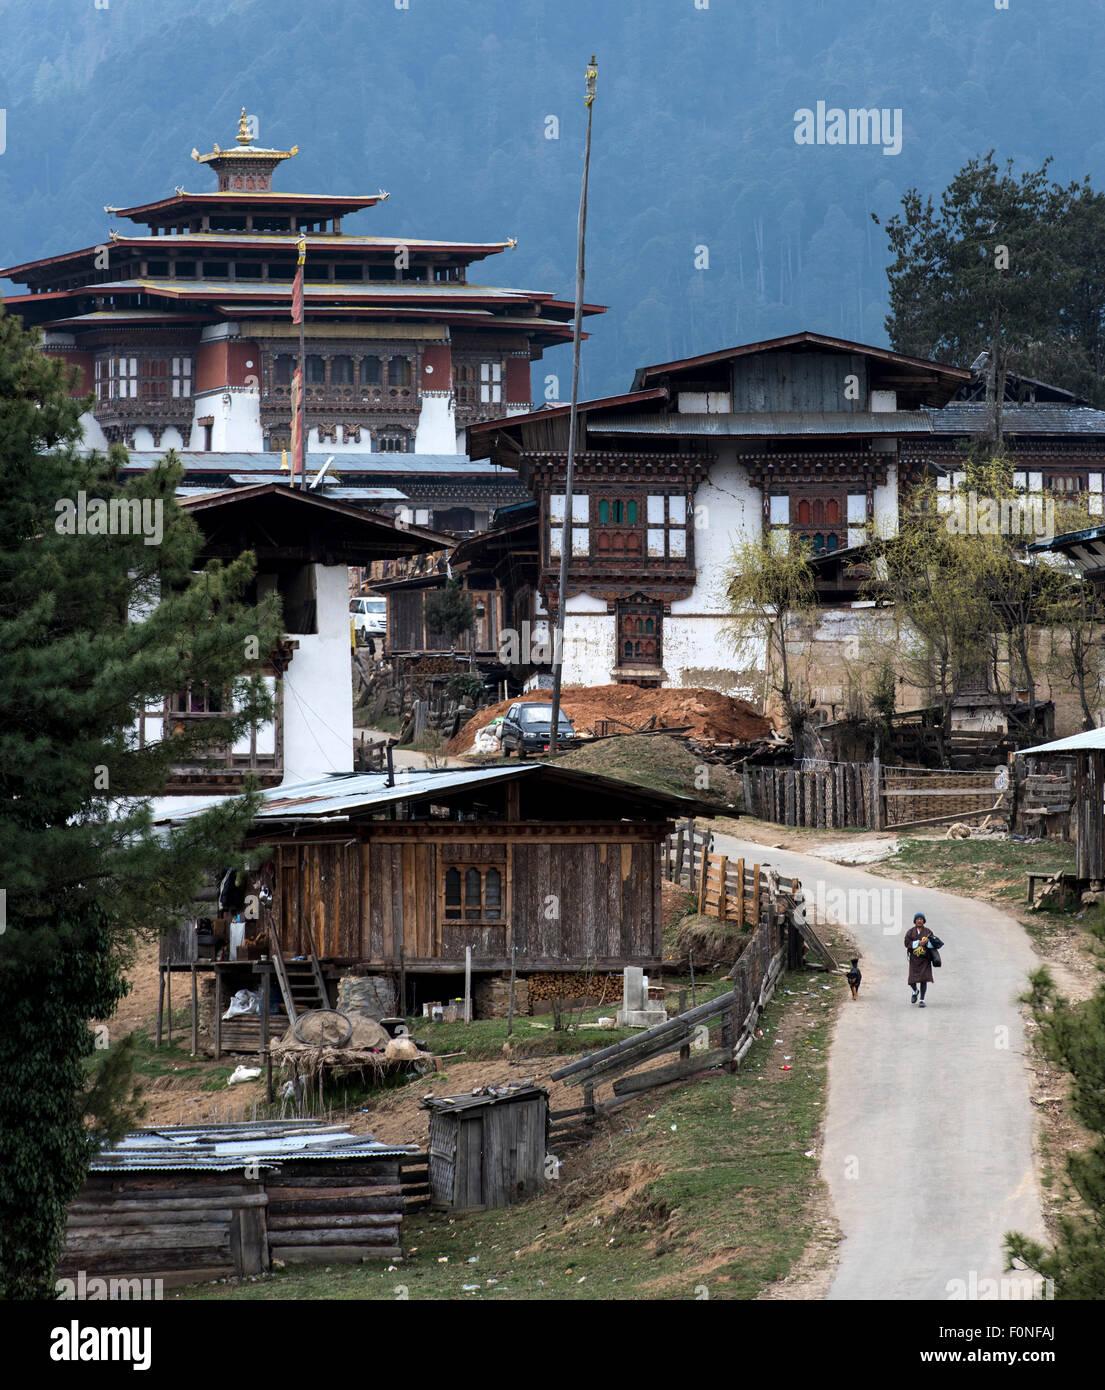 View of Gangtey monastery Bhutan - Stock Image